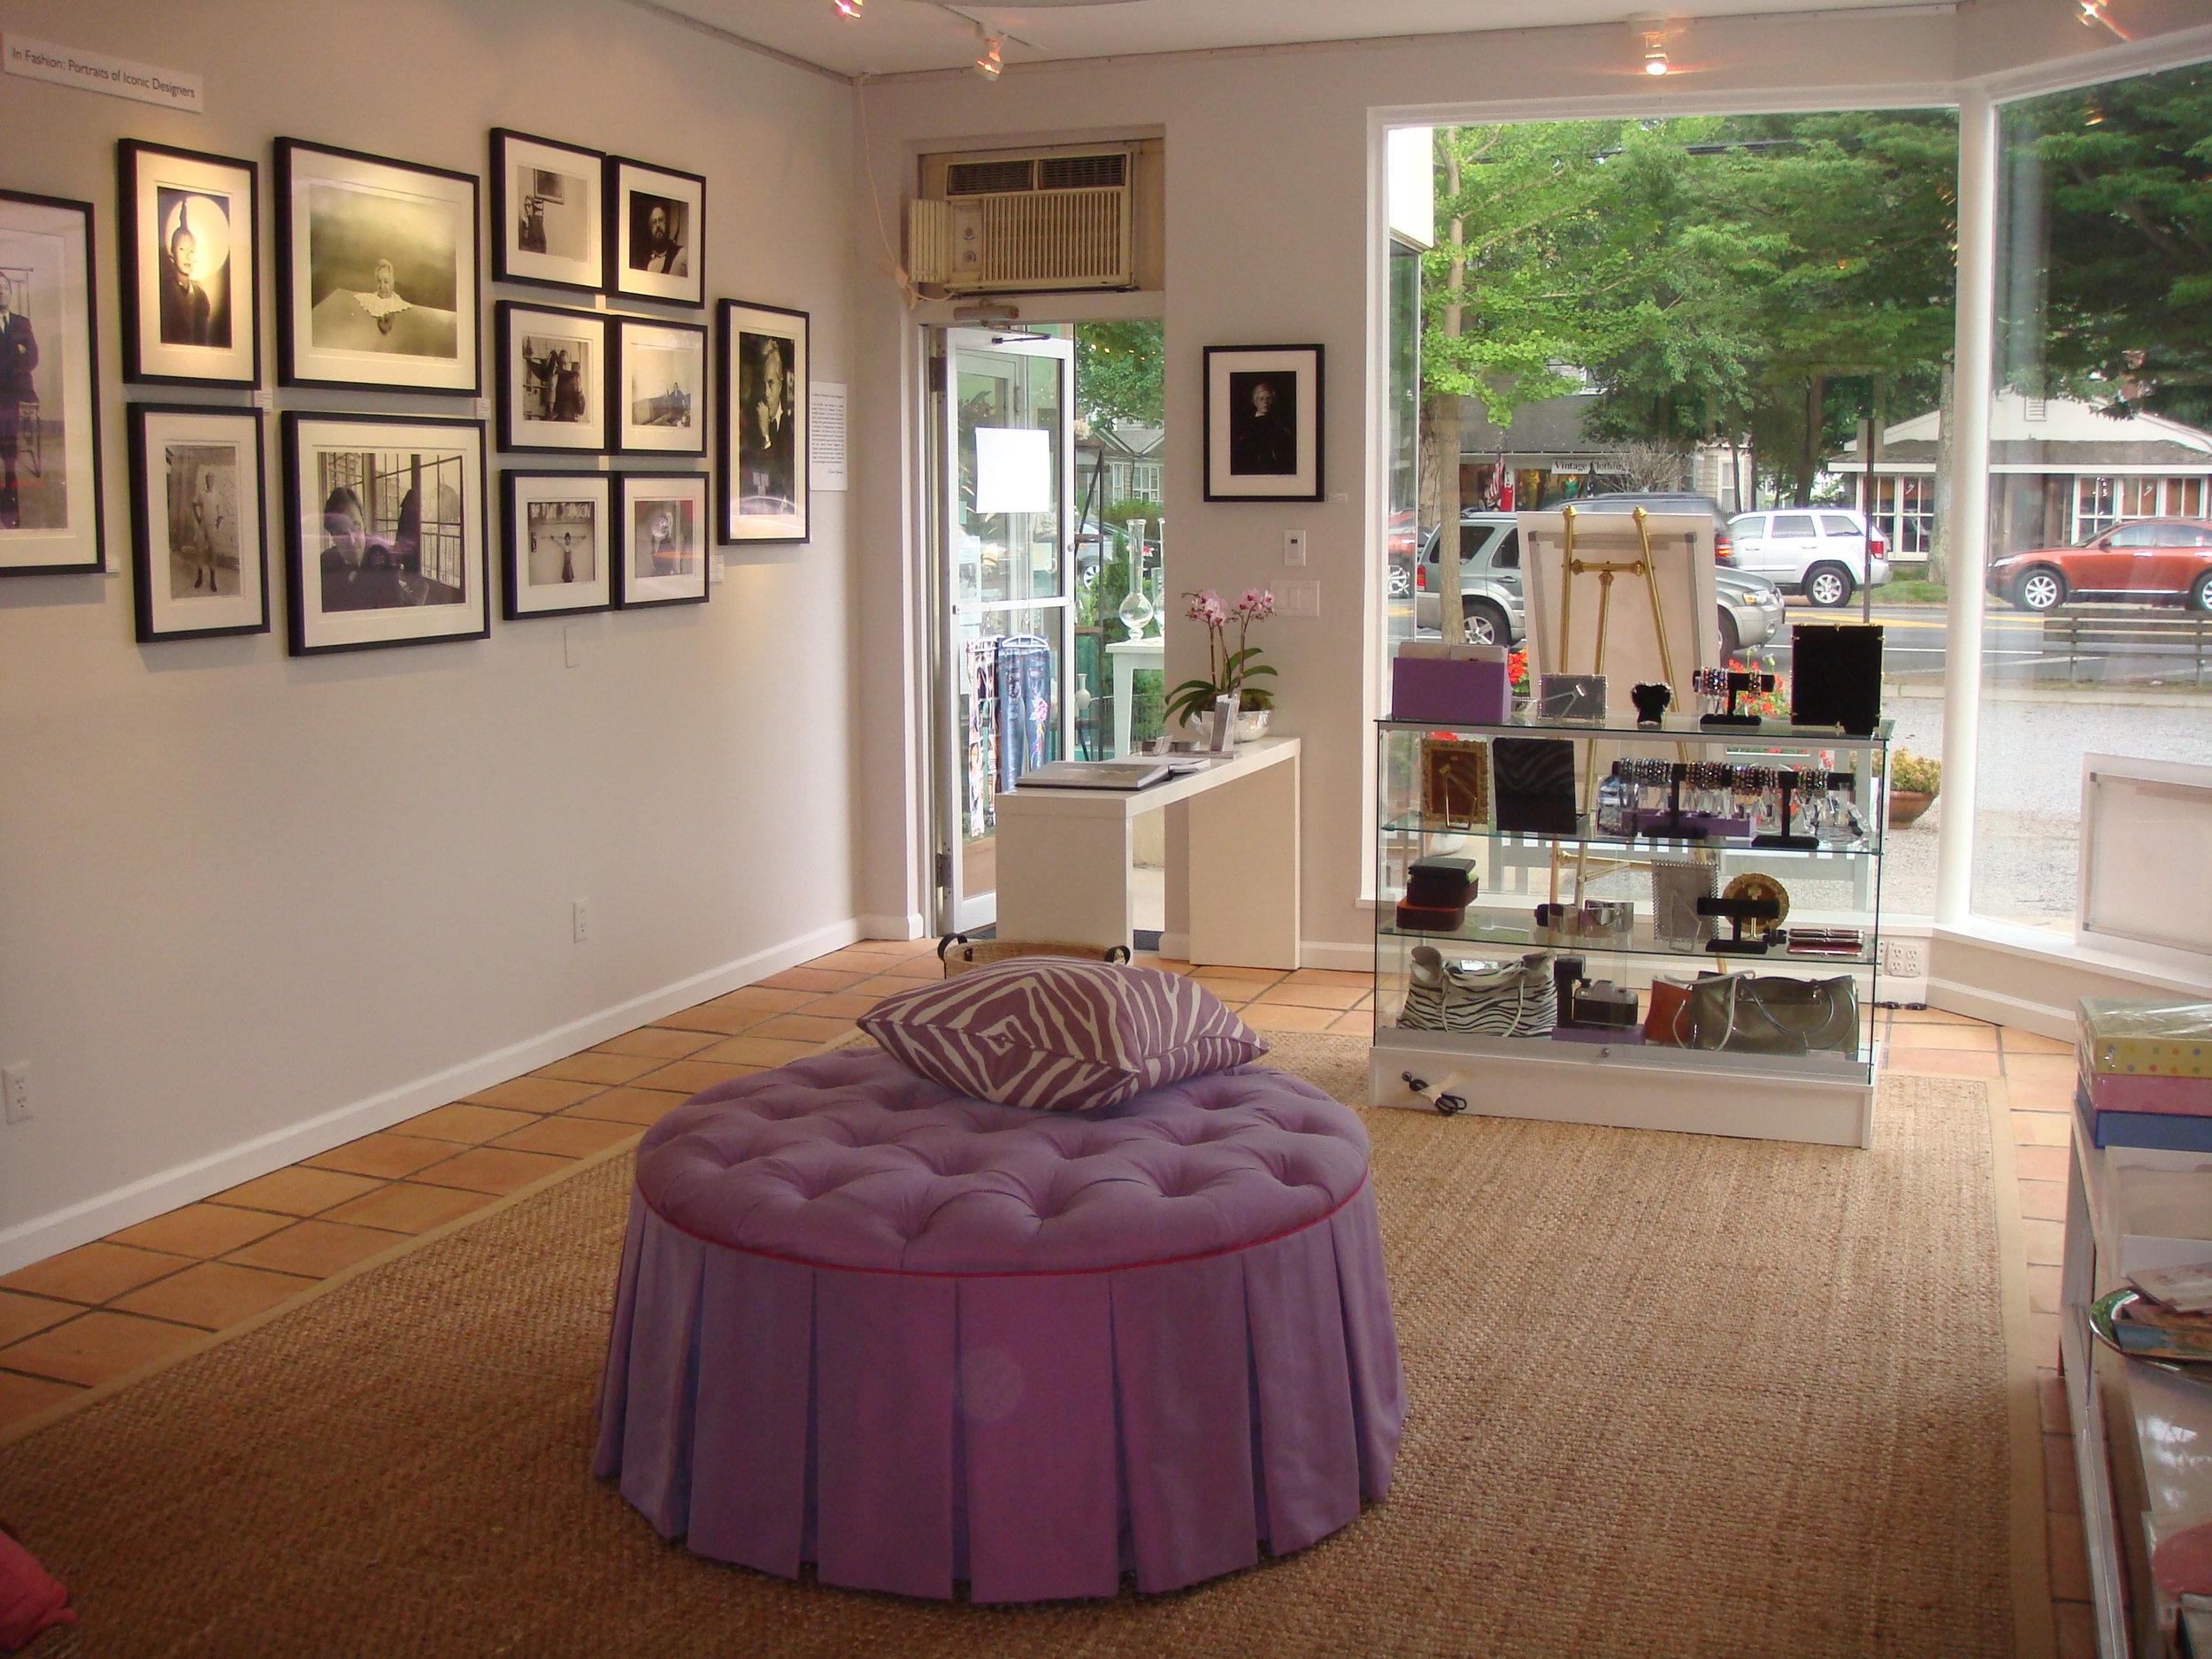 Lucille_Khornak_Gallery_Bridgehampton_03.JPG